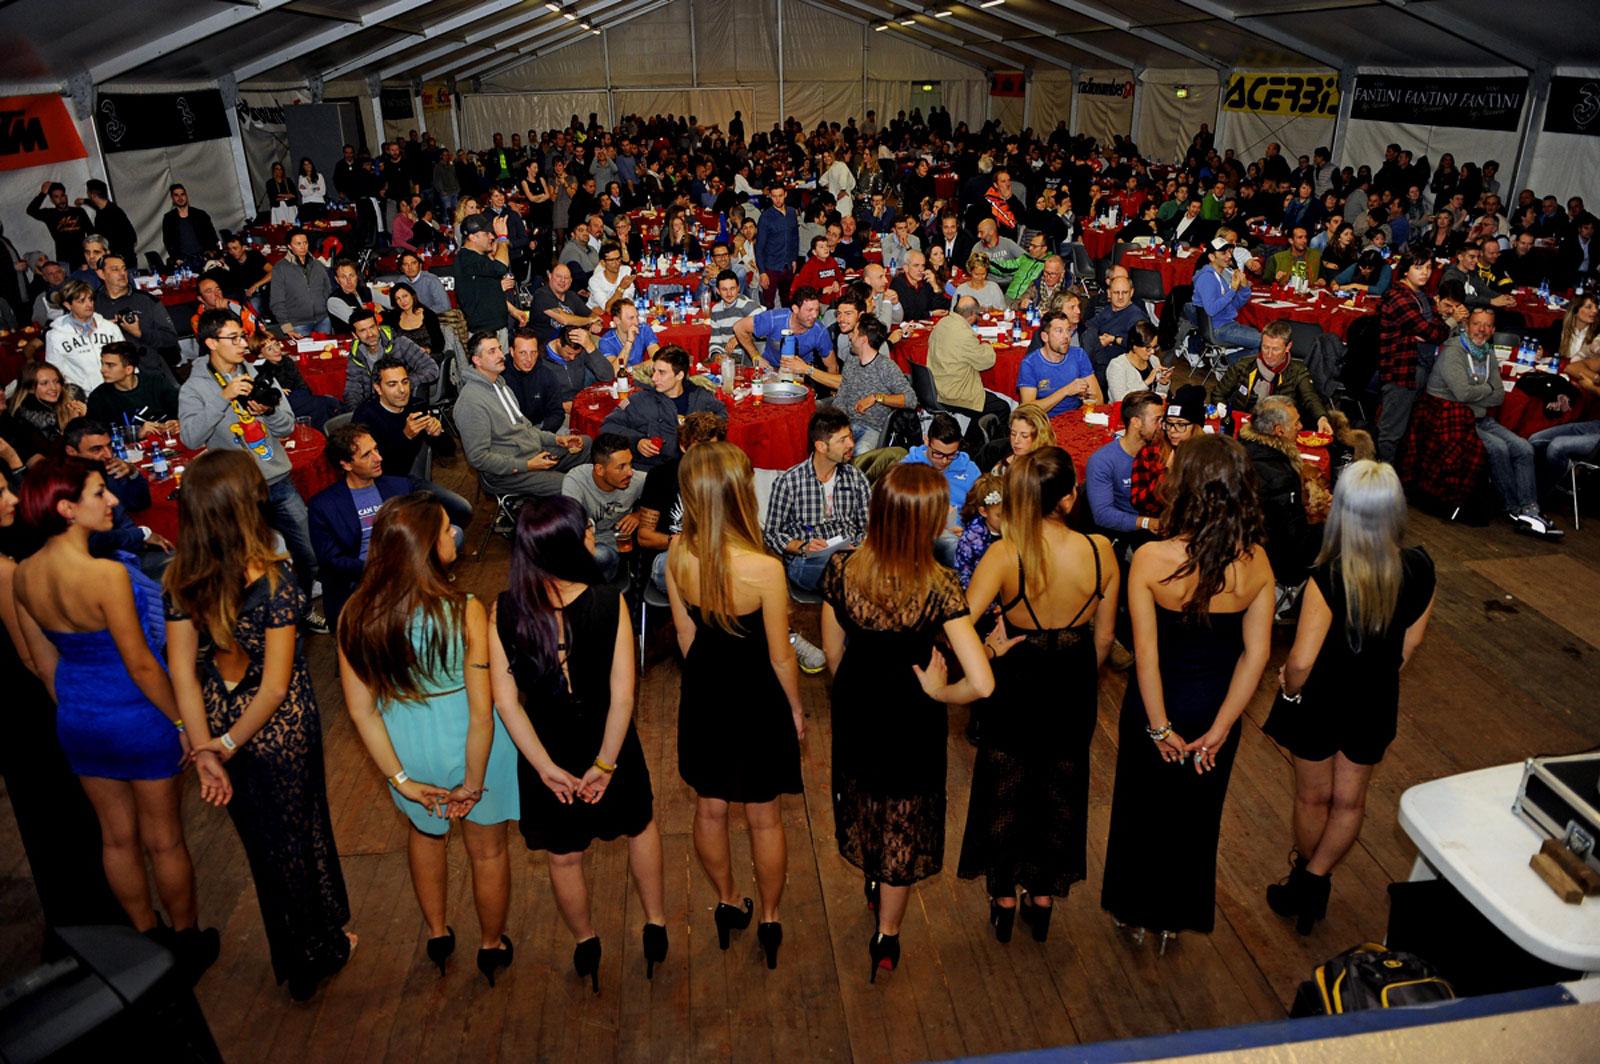 Ottobiano Sport Show 2015